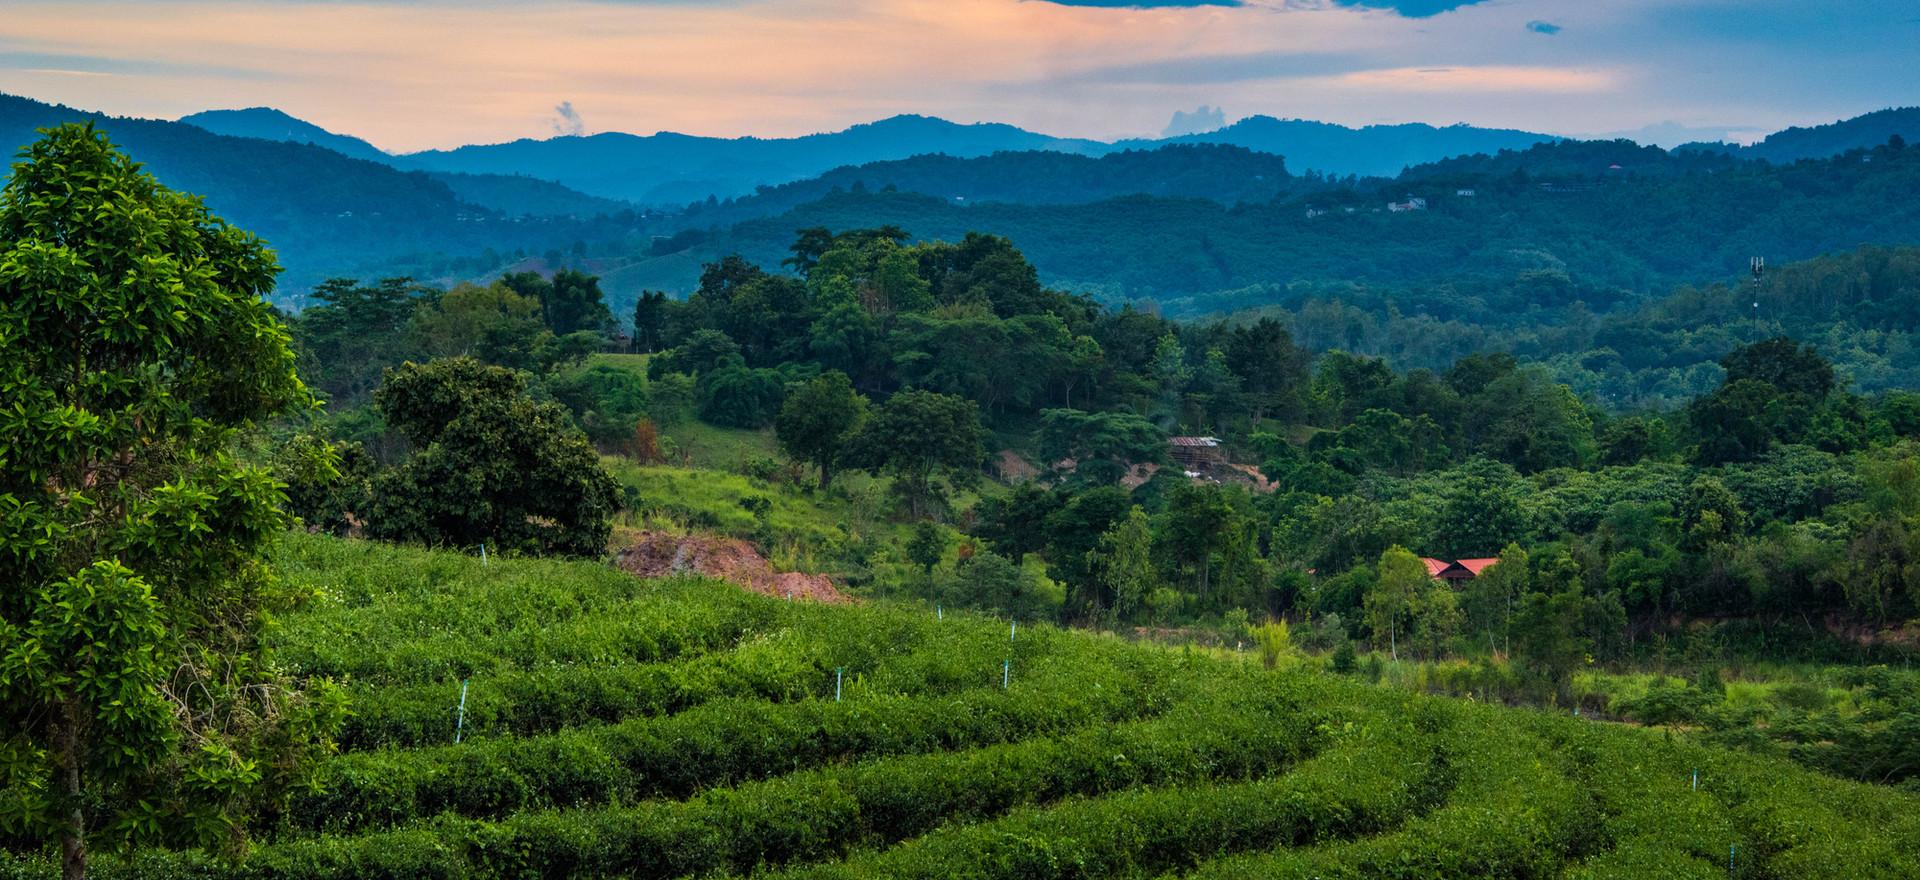 Thailand-2592.jpg